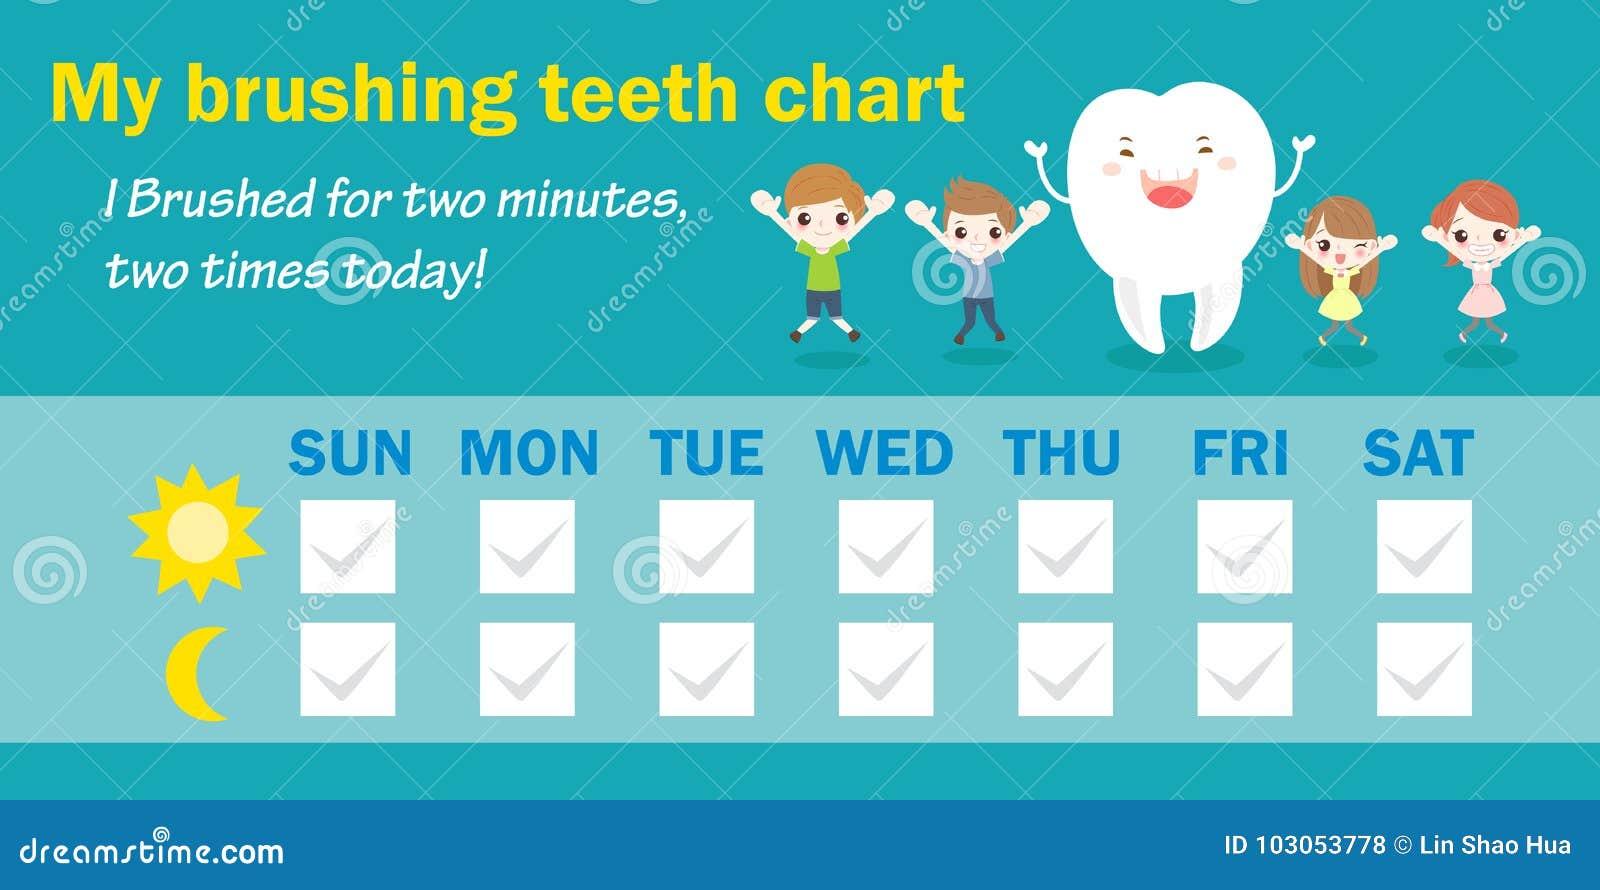 Brushing teeth chart